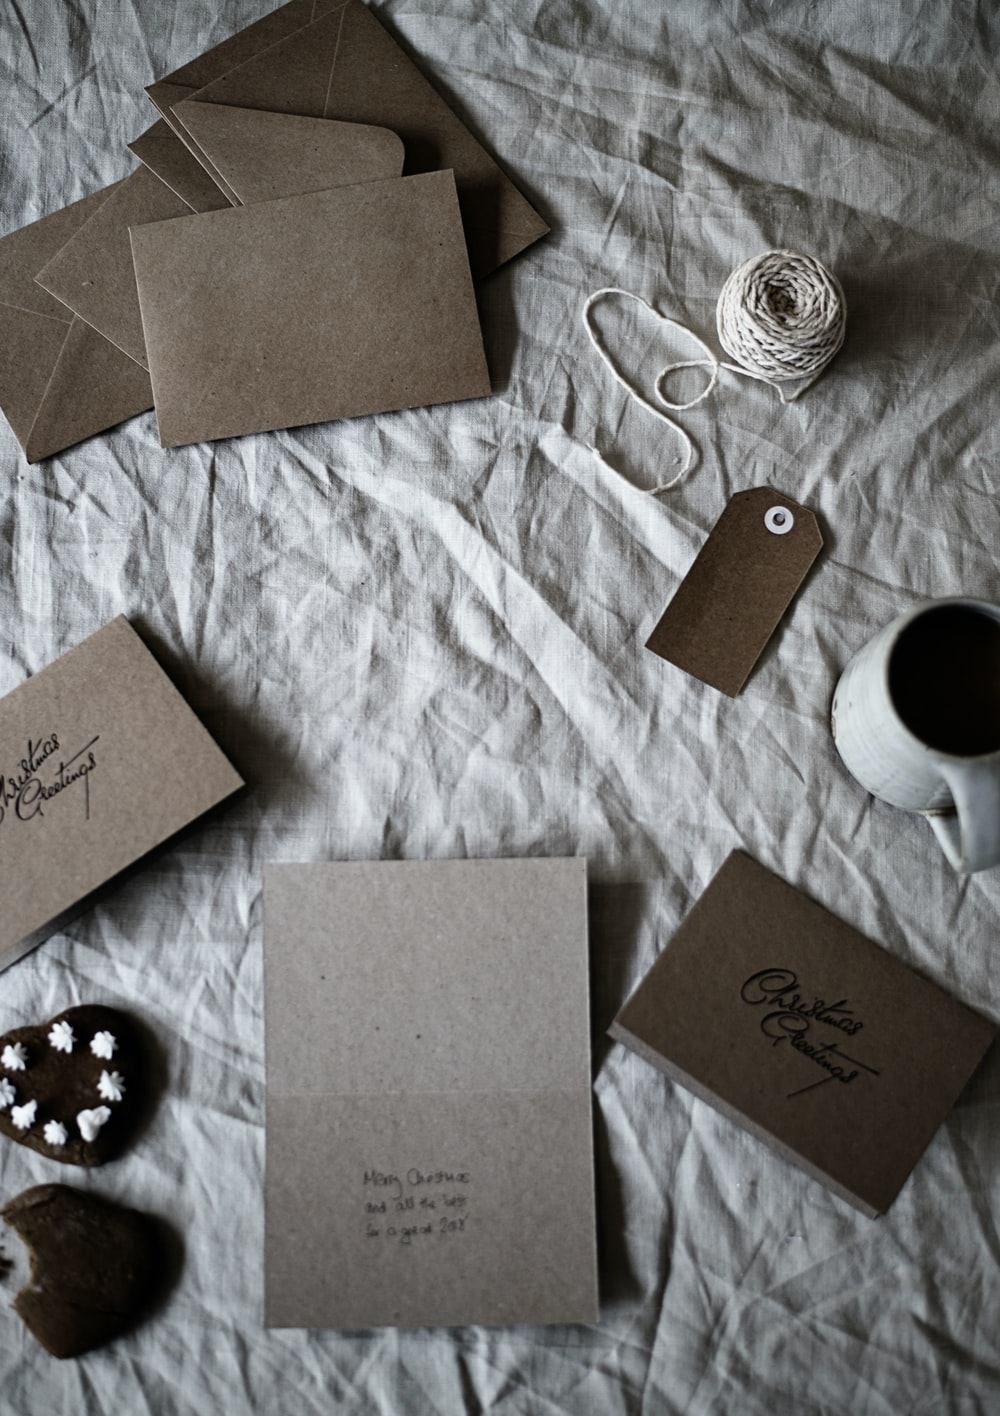 brown envelops on gray textile